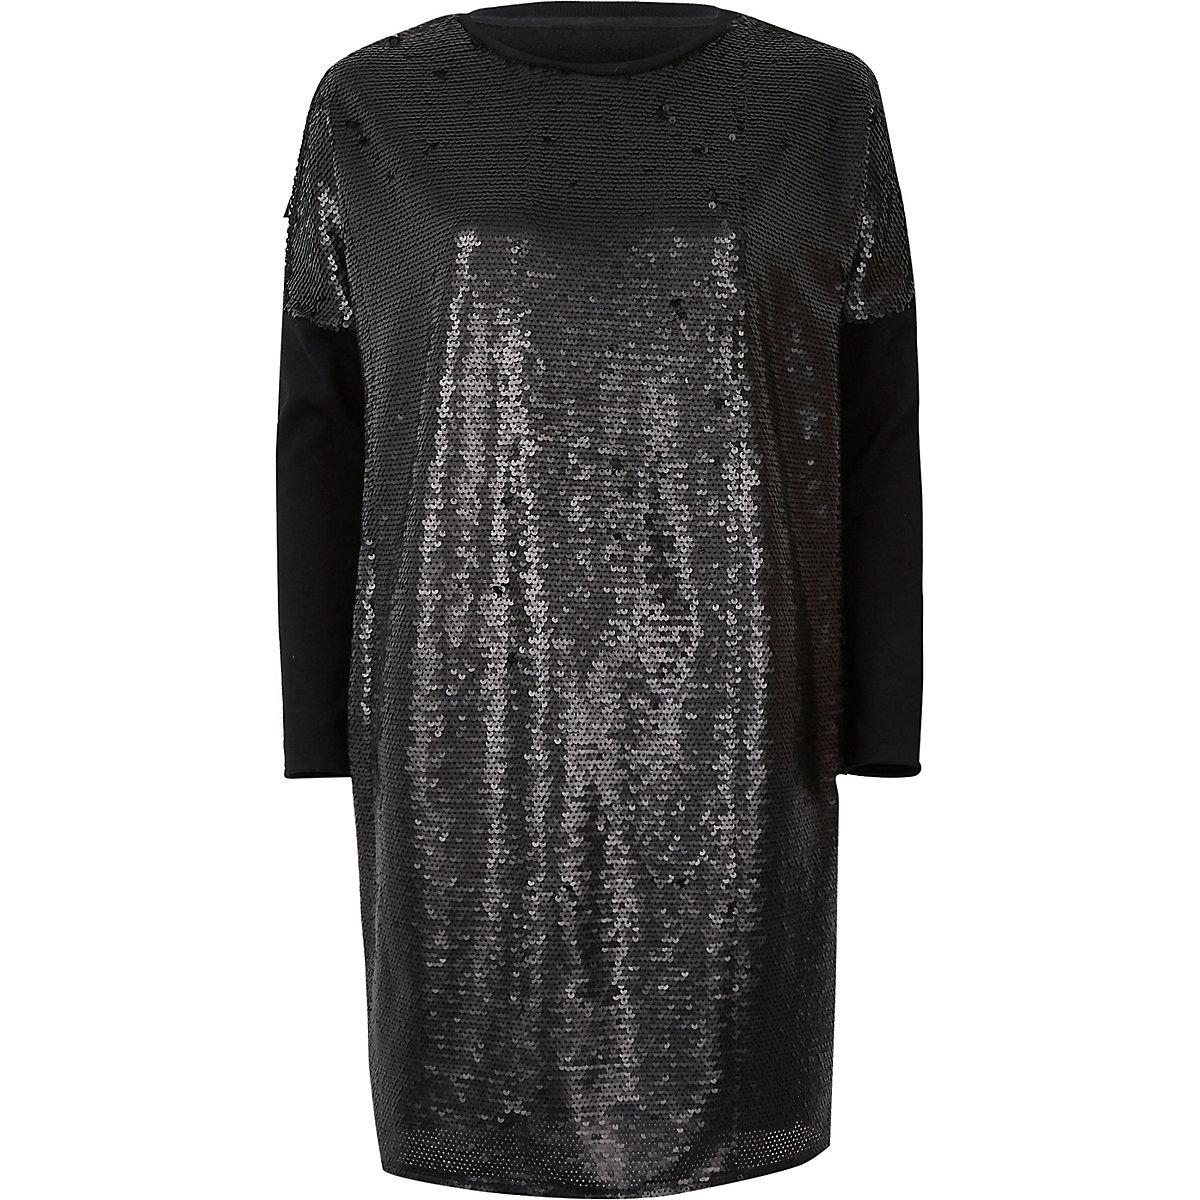 Black sequin oversized long sleeve T-shirt